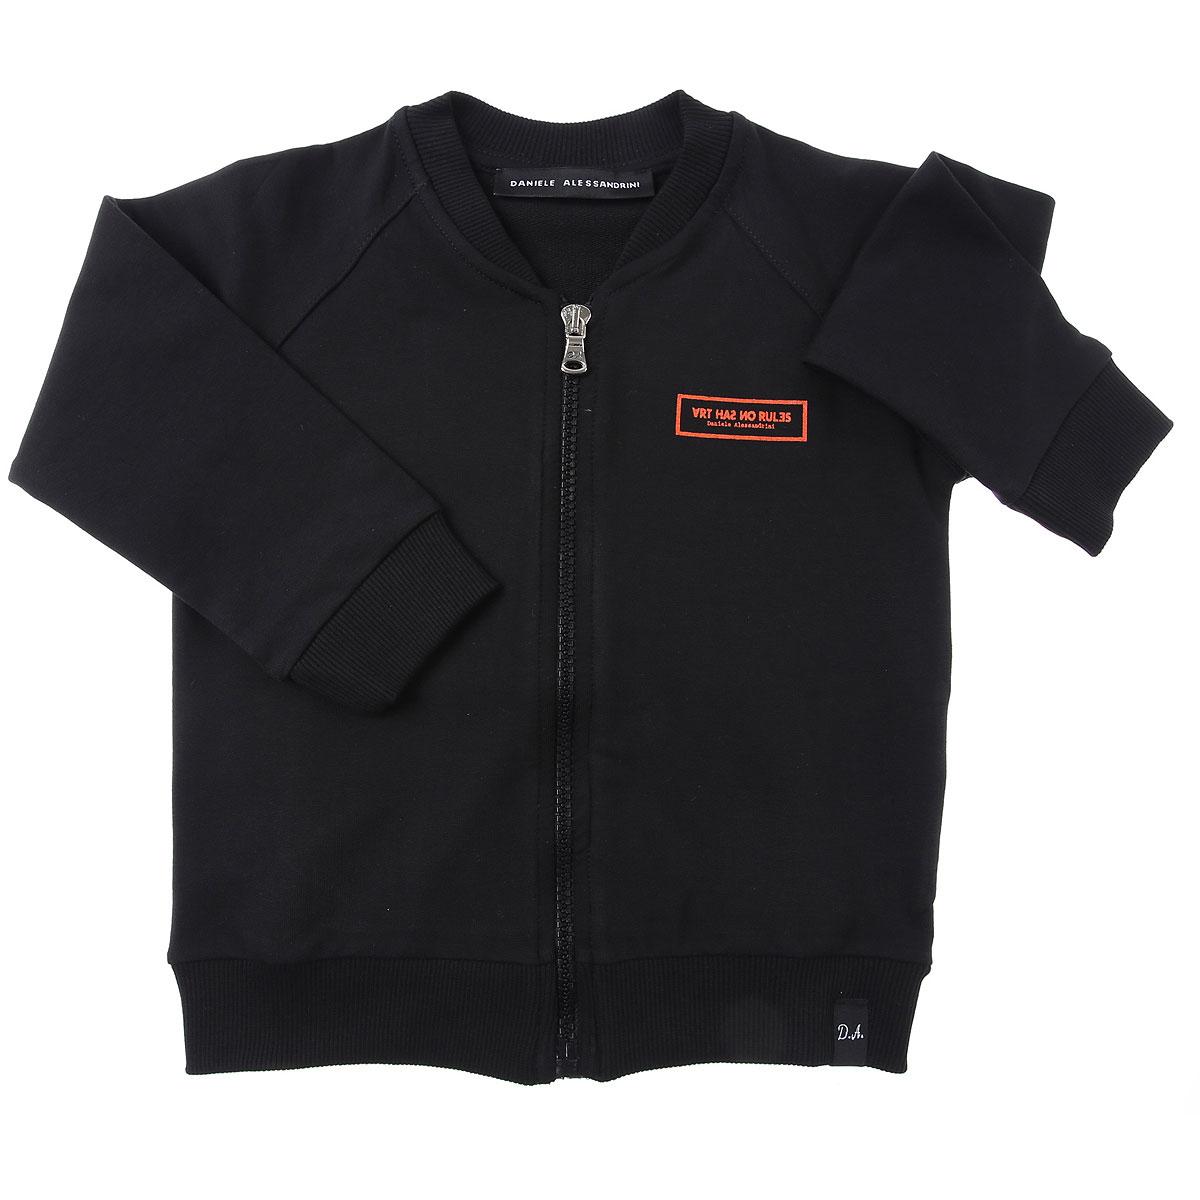 Daniele Alessandrini Baby Sweatshirts & Hoodies for Boys On Sale, Black, Cotton, 2019, 12 M 18M 2Y 3Y 4Y 9M